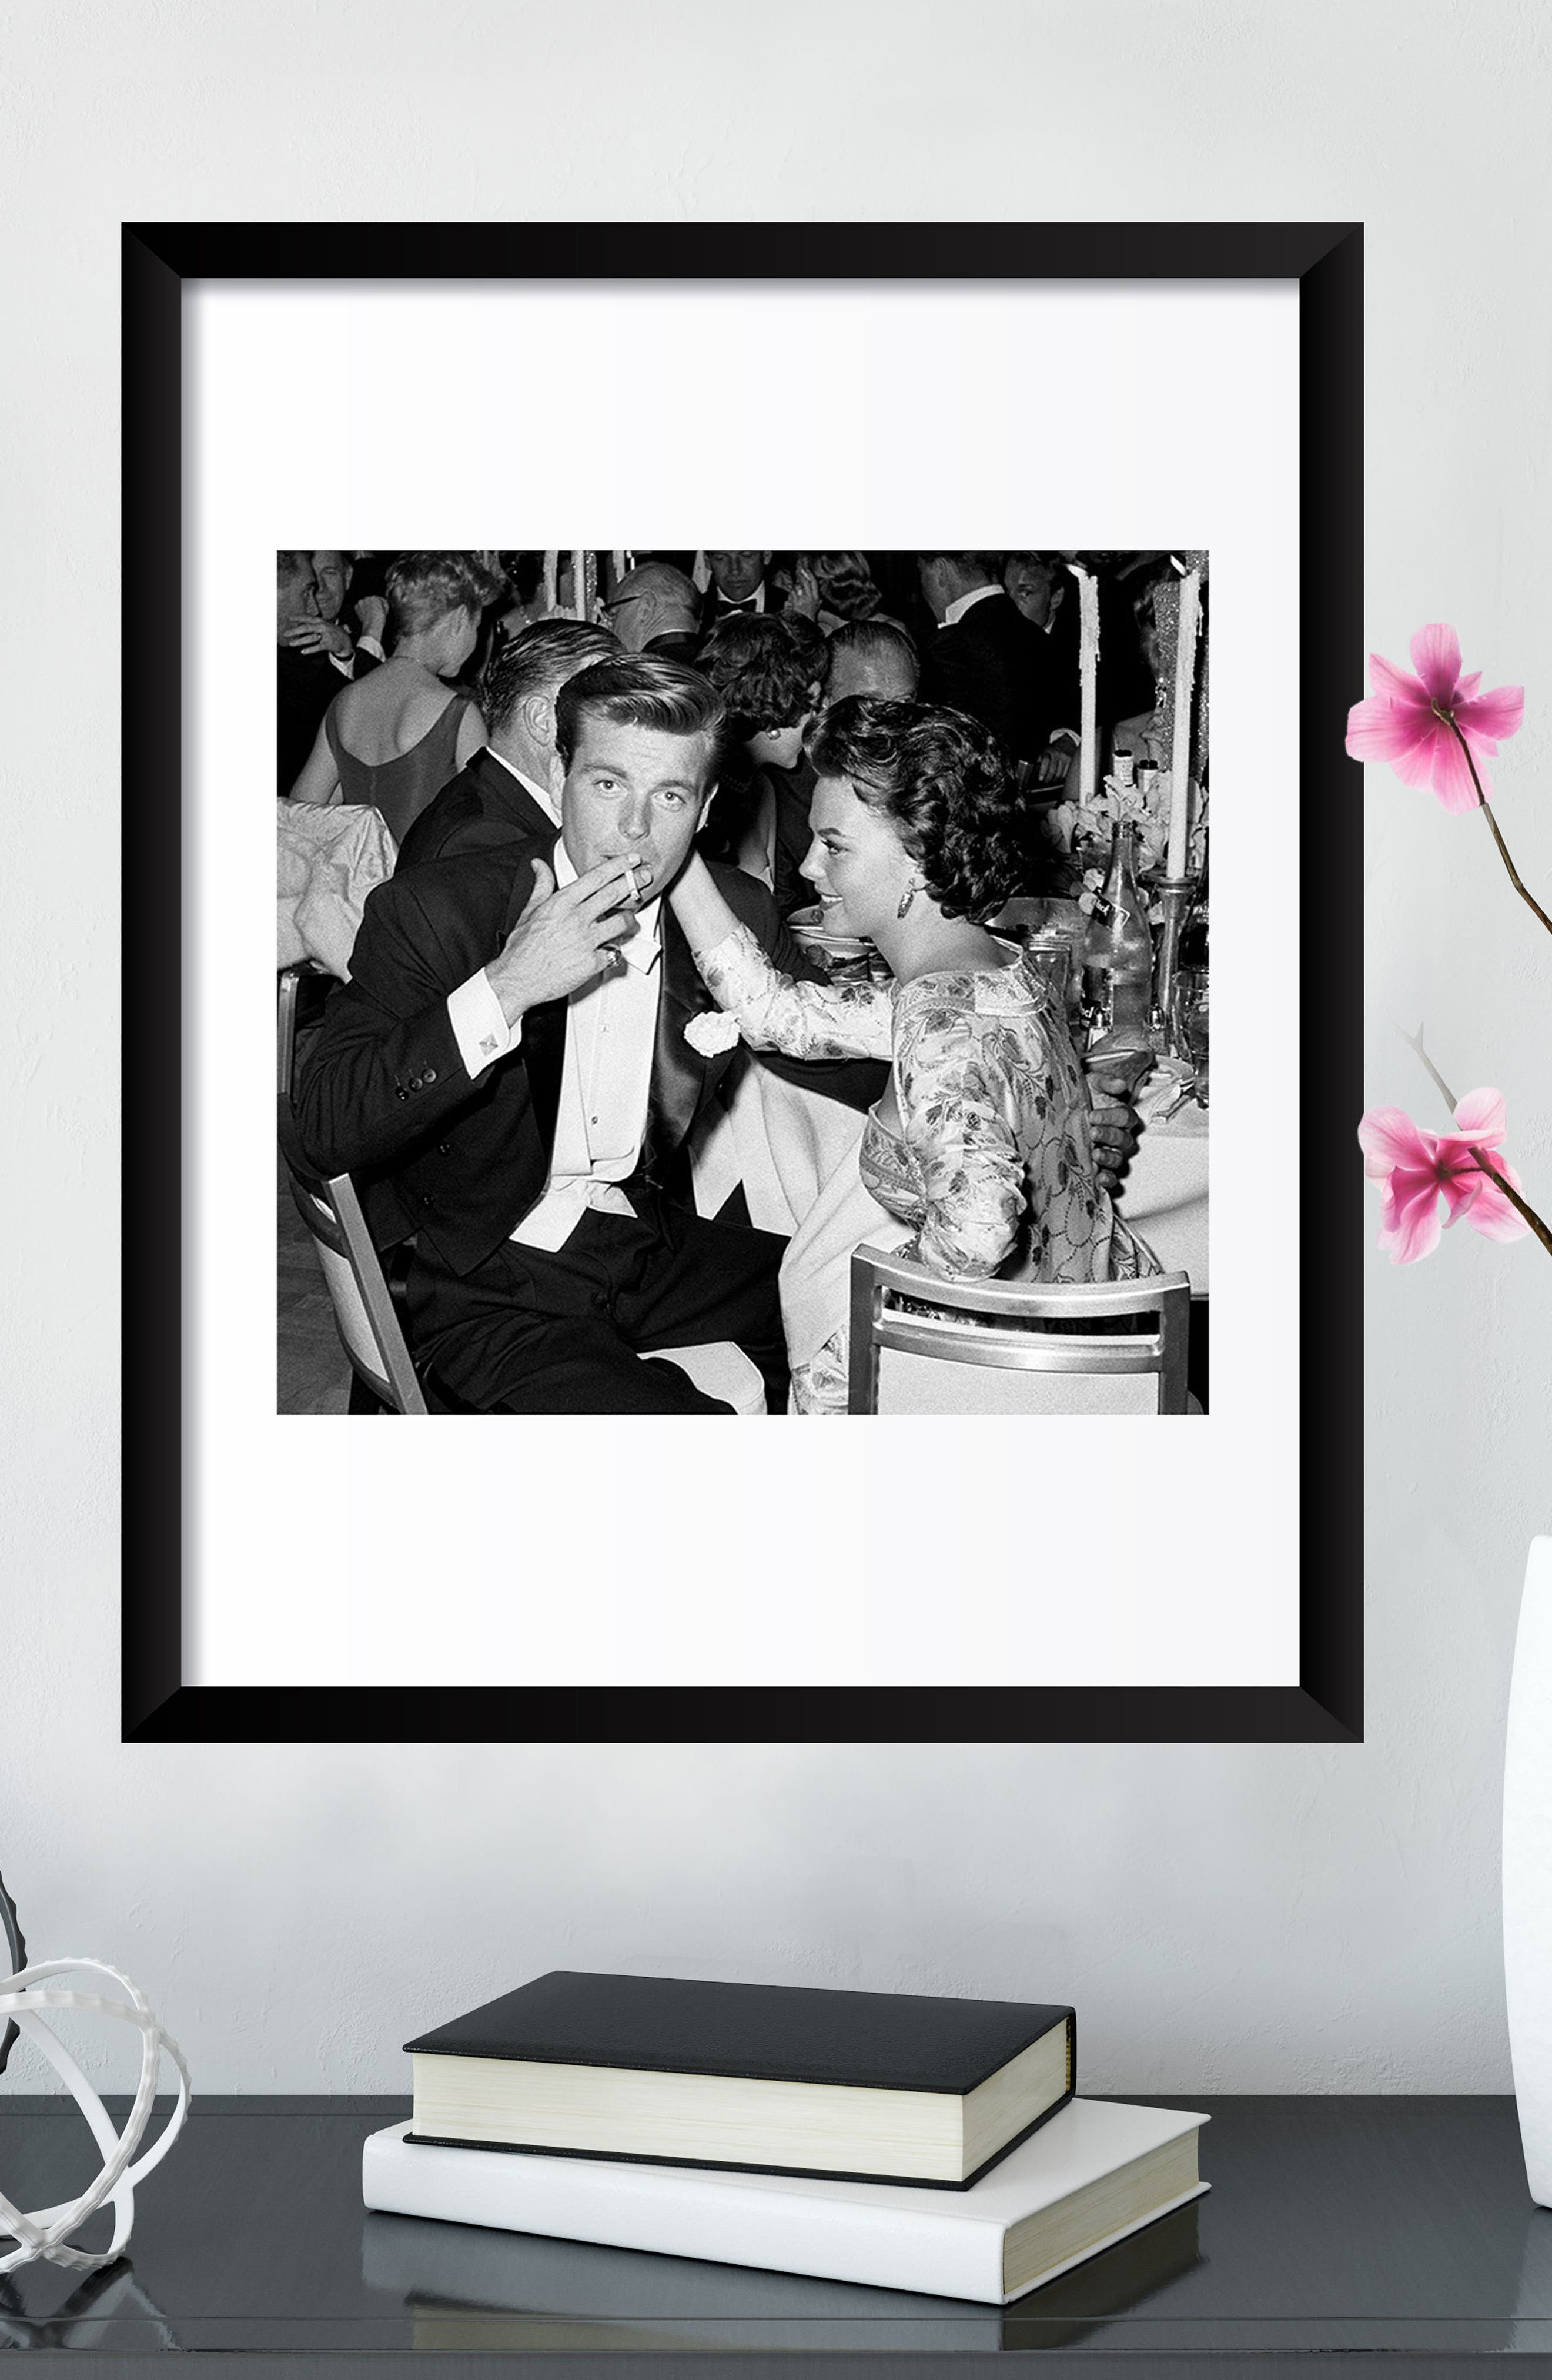 Robert Wagner & Natalie Wood Fine Art Print,                             Alternate thumbnail 2, color,                             001